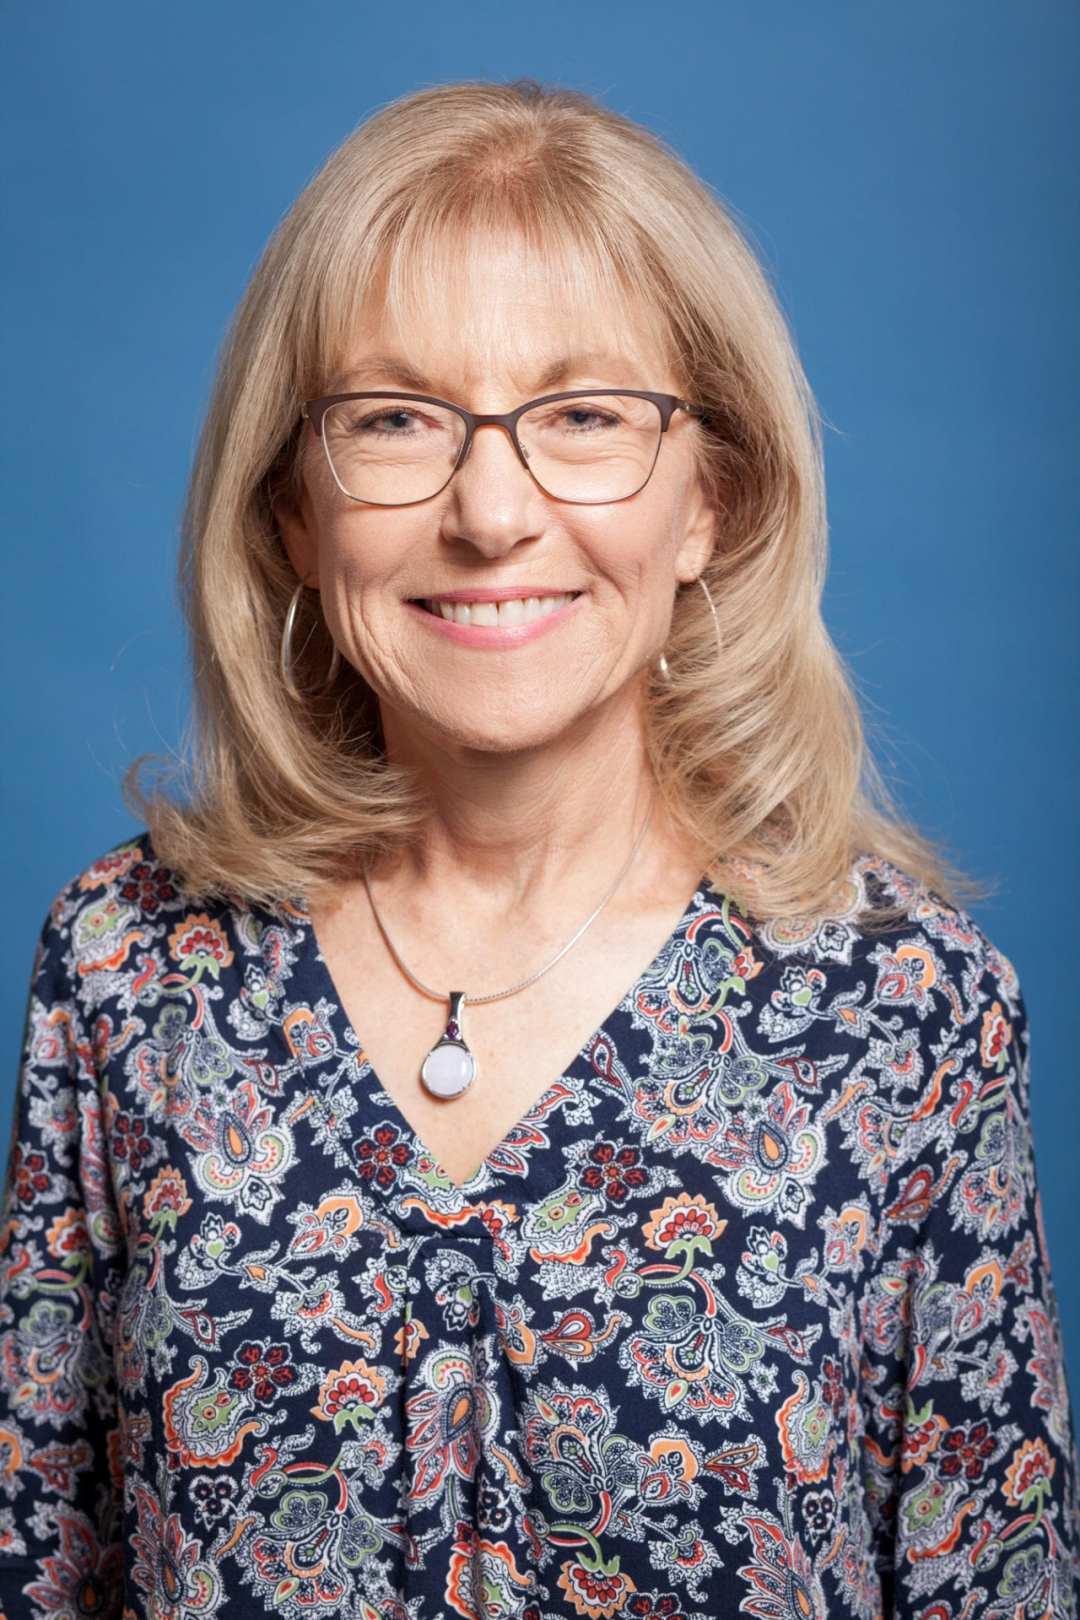 Marianne Emmerling - Vice President, Property Management